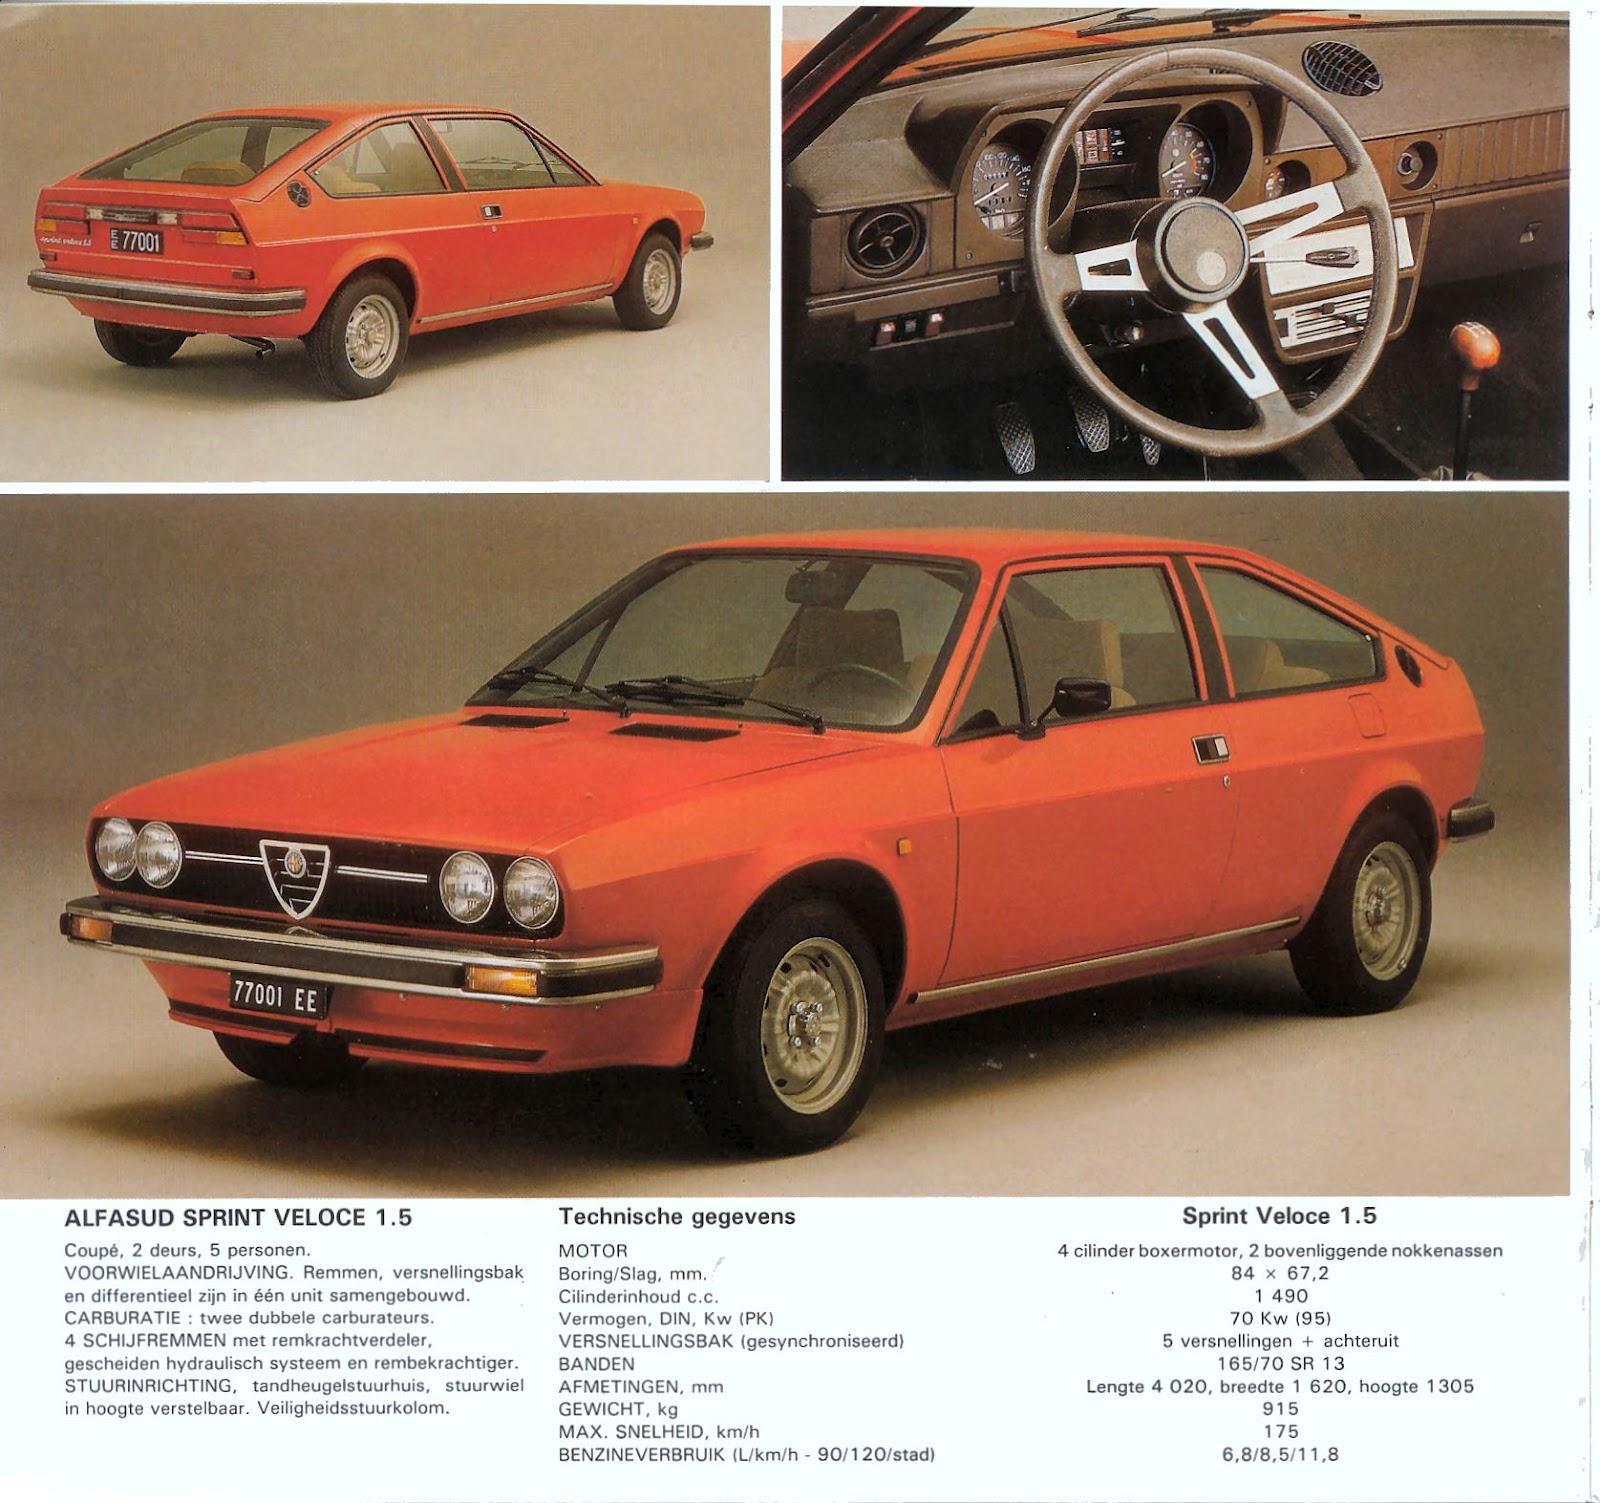 1981-Alfa-Romeo-Alfasud-Sprint-Veloce1.jpg